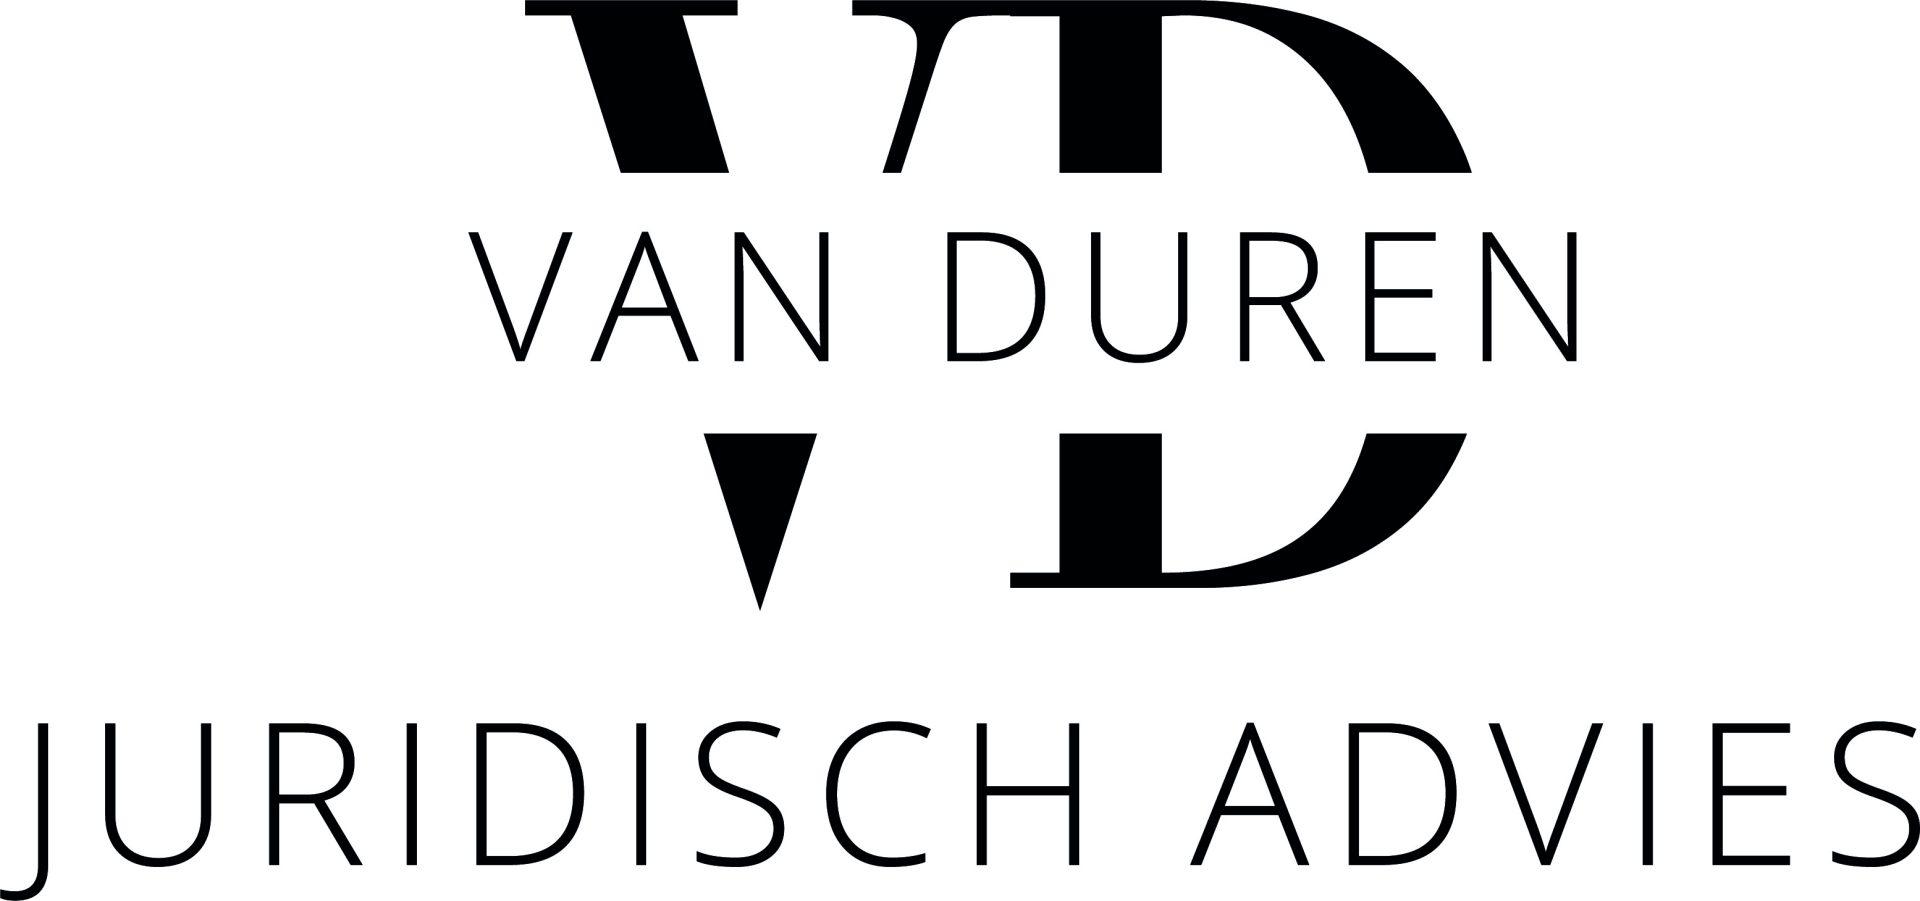 Vandurenjuridischadvies_logo